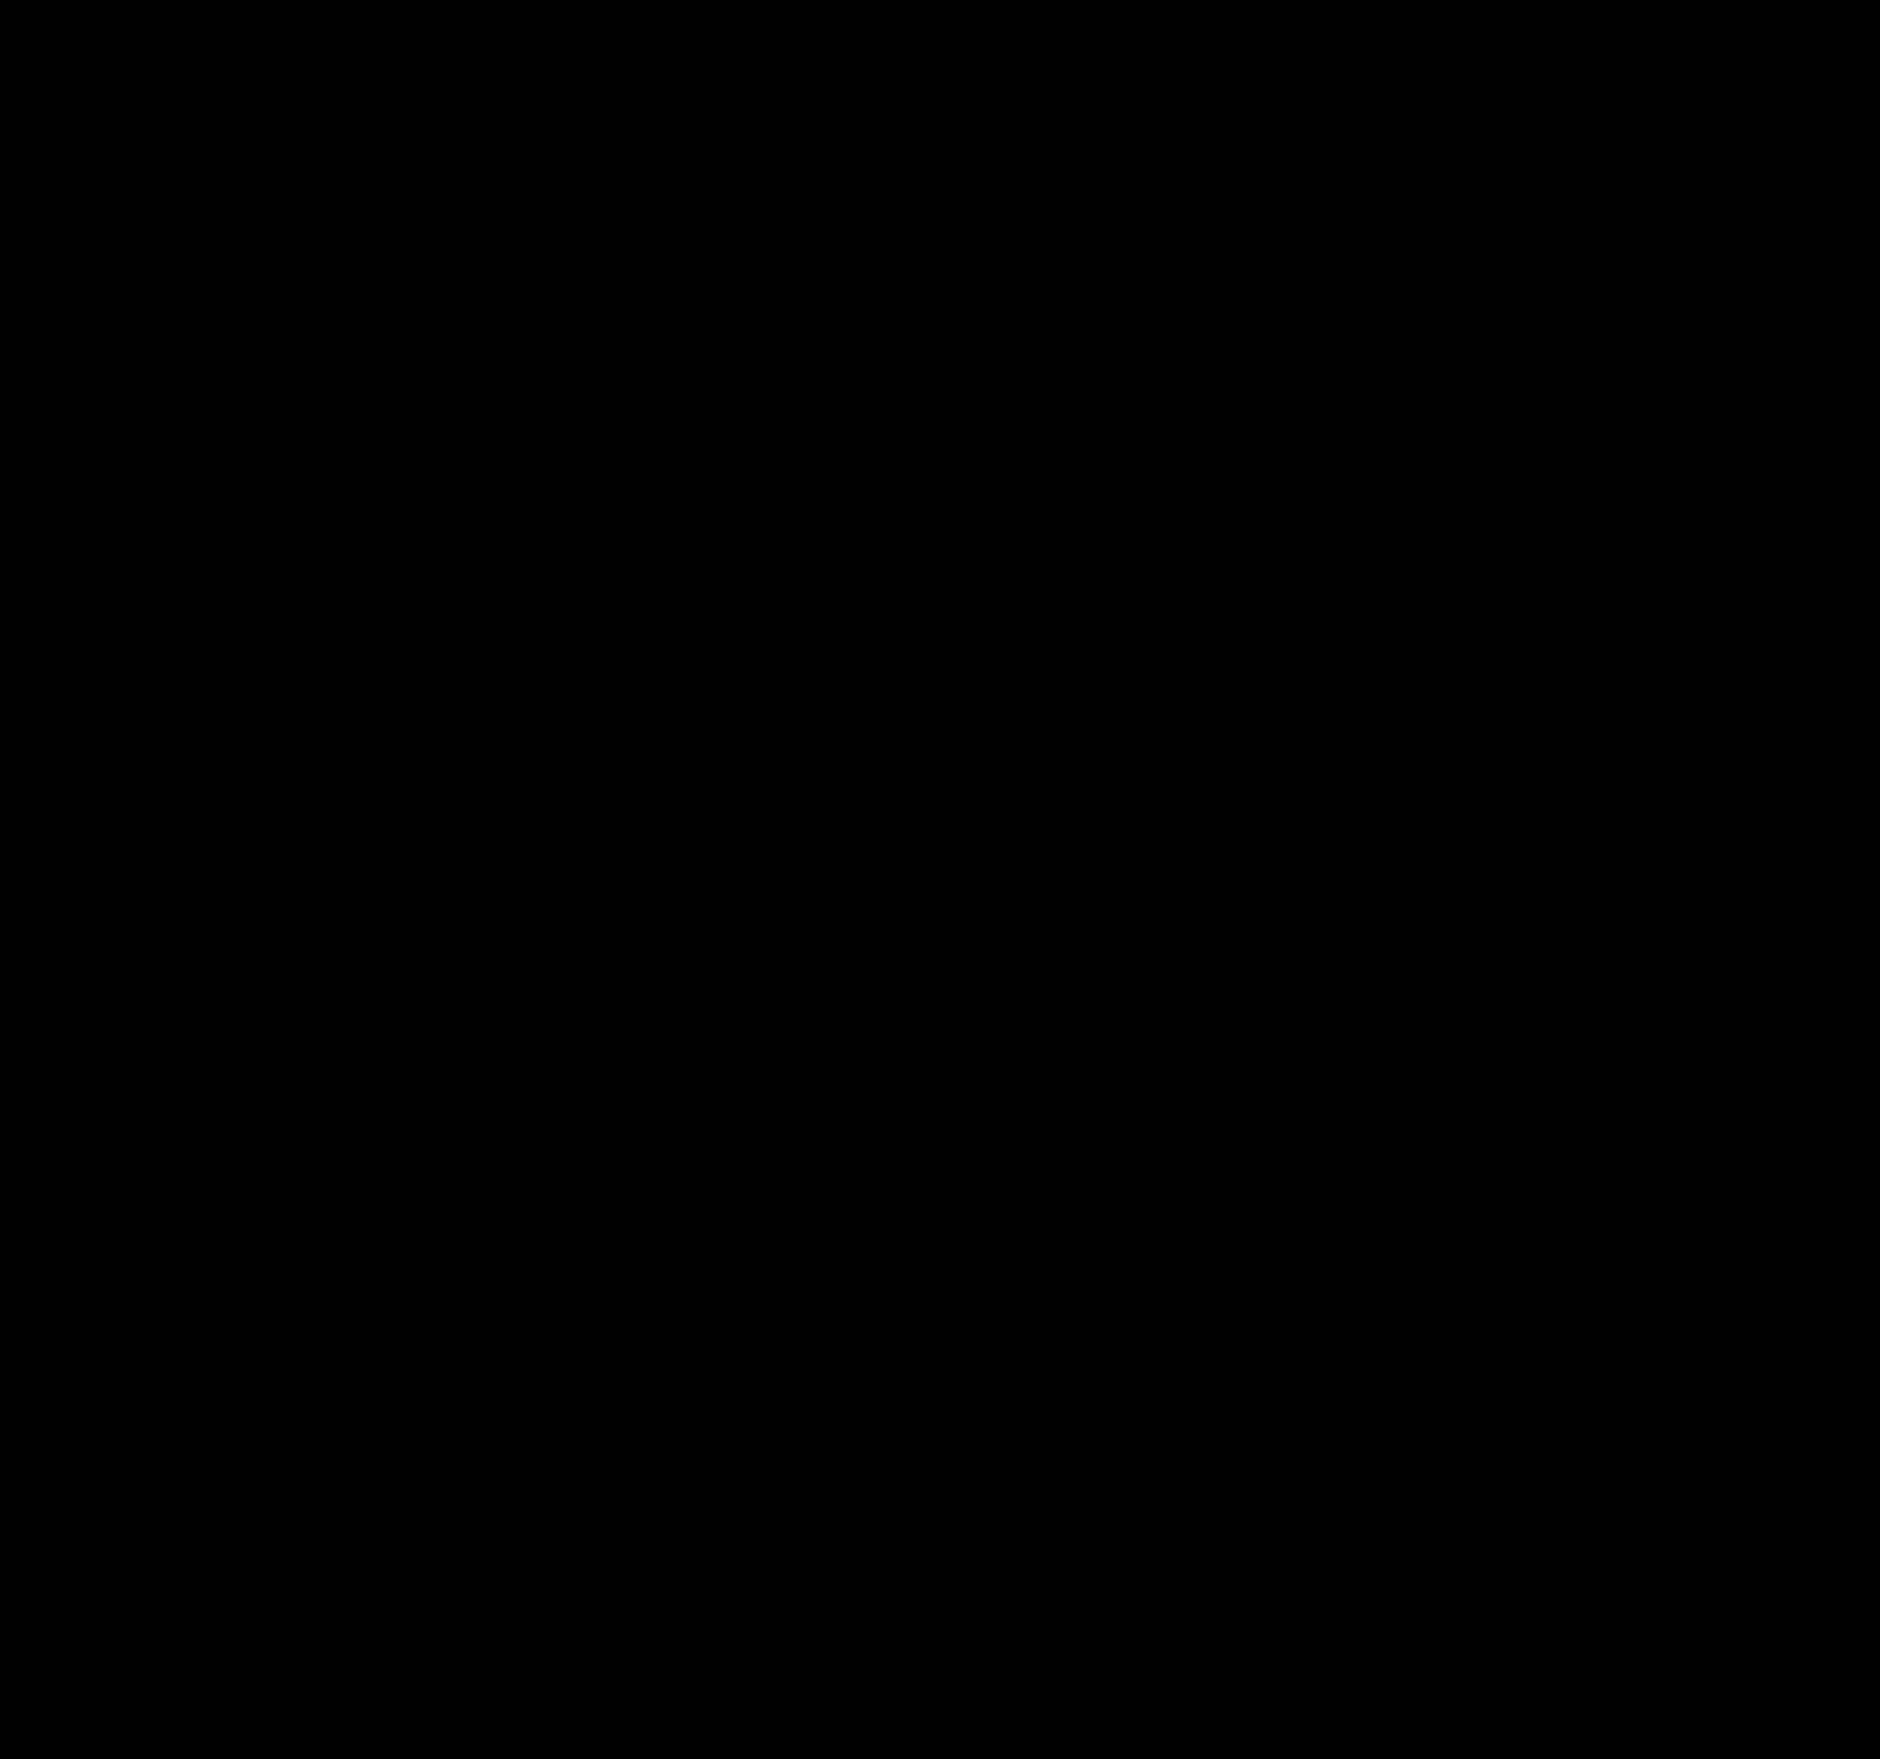 CAZADORA POLIPIEL NEGRA